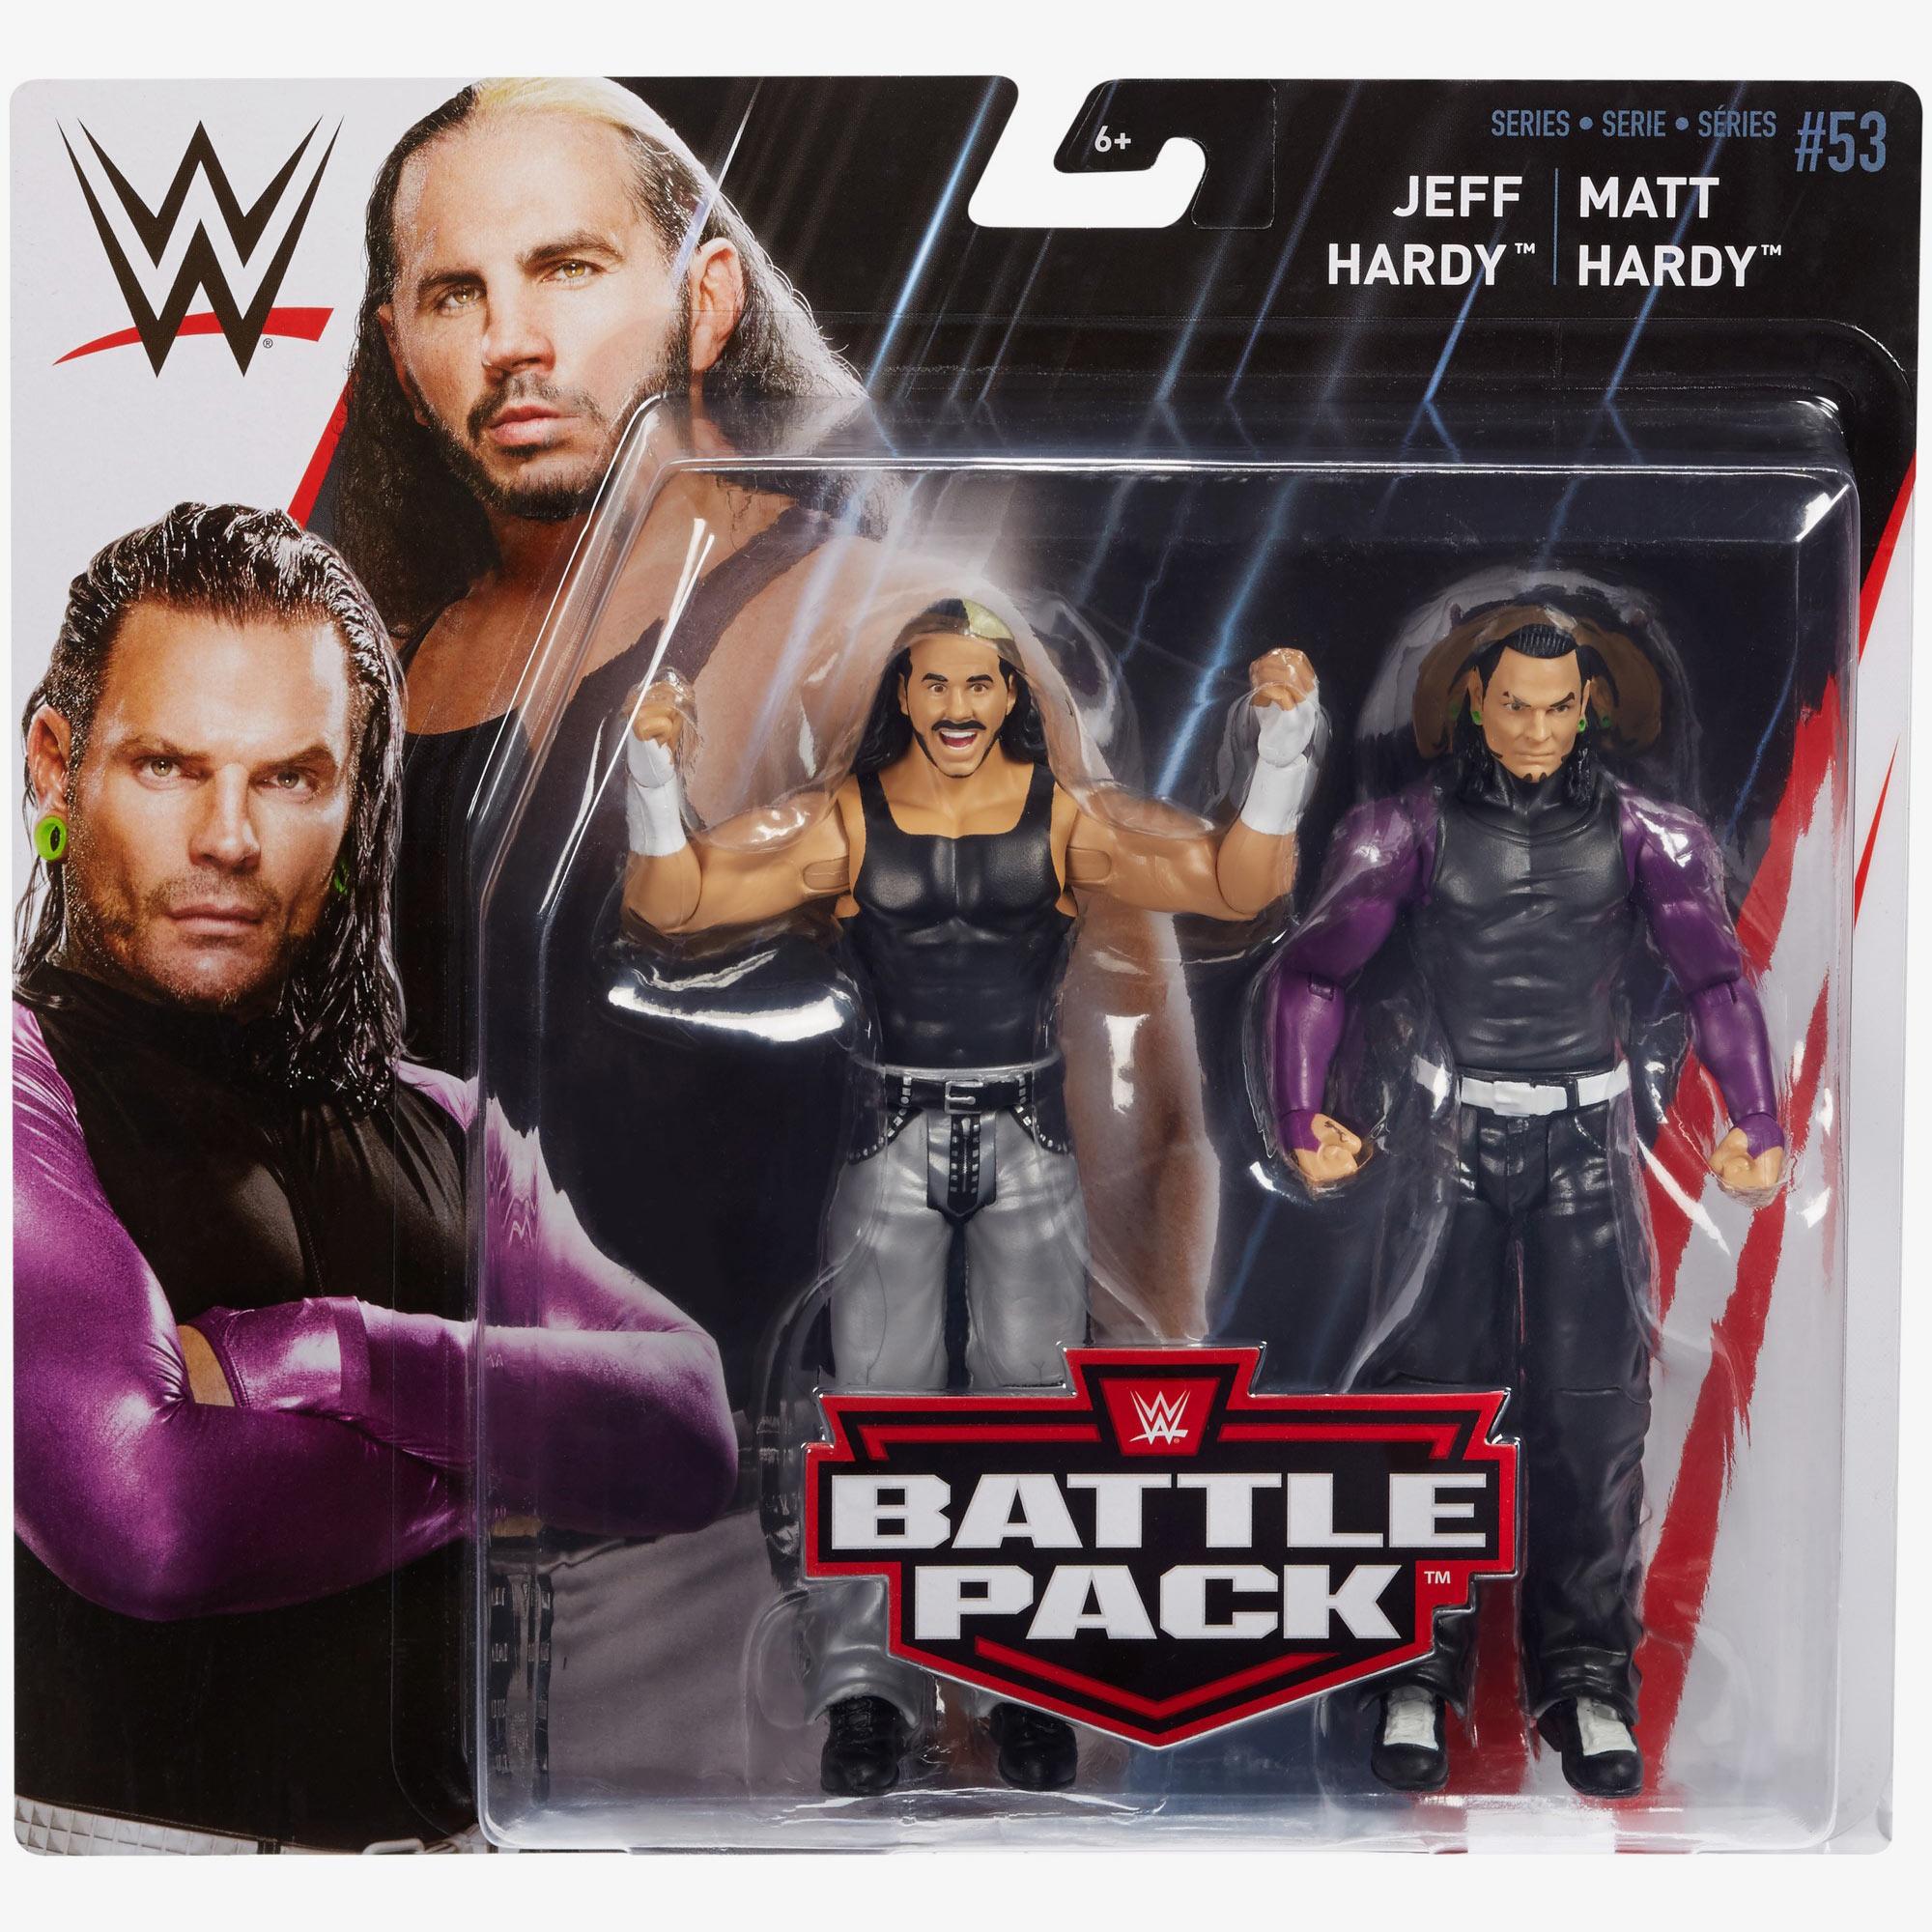 WWE Battle Pack Series 53 (2018) Truc400